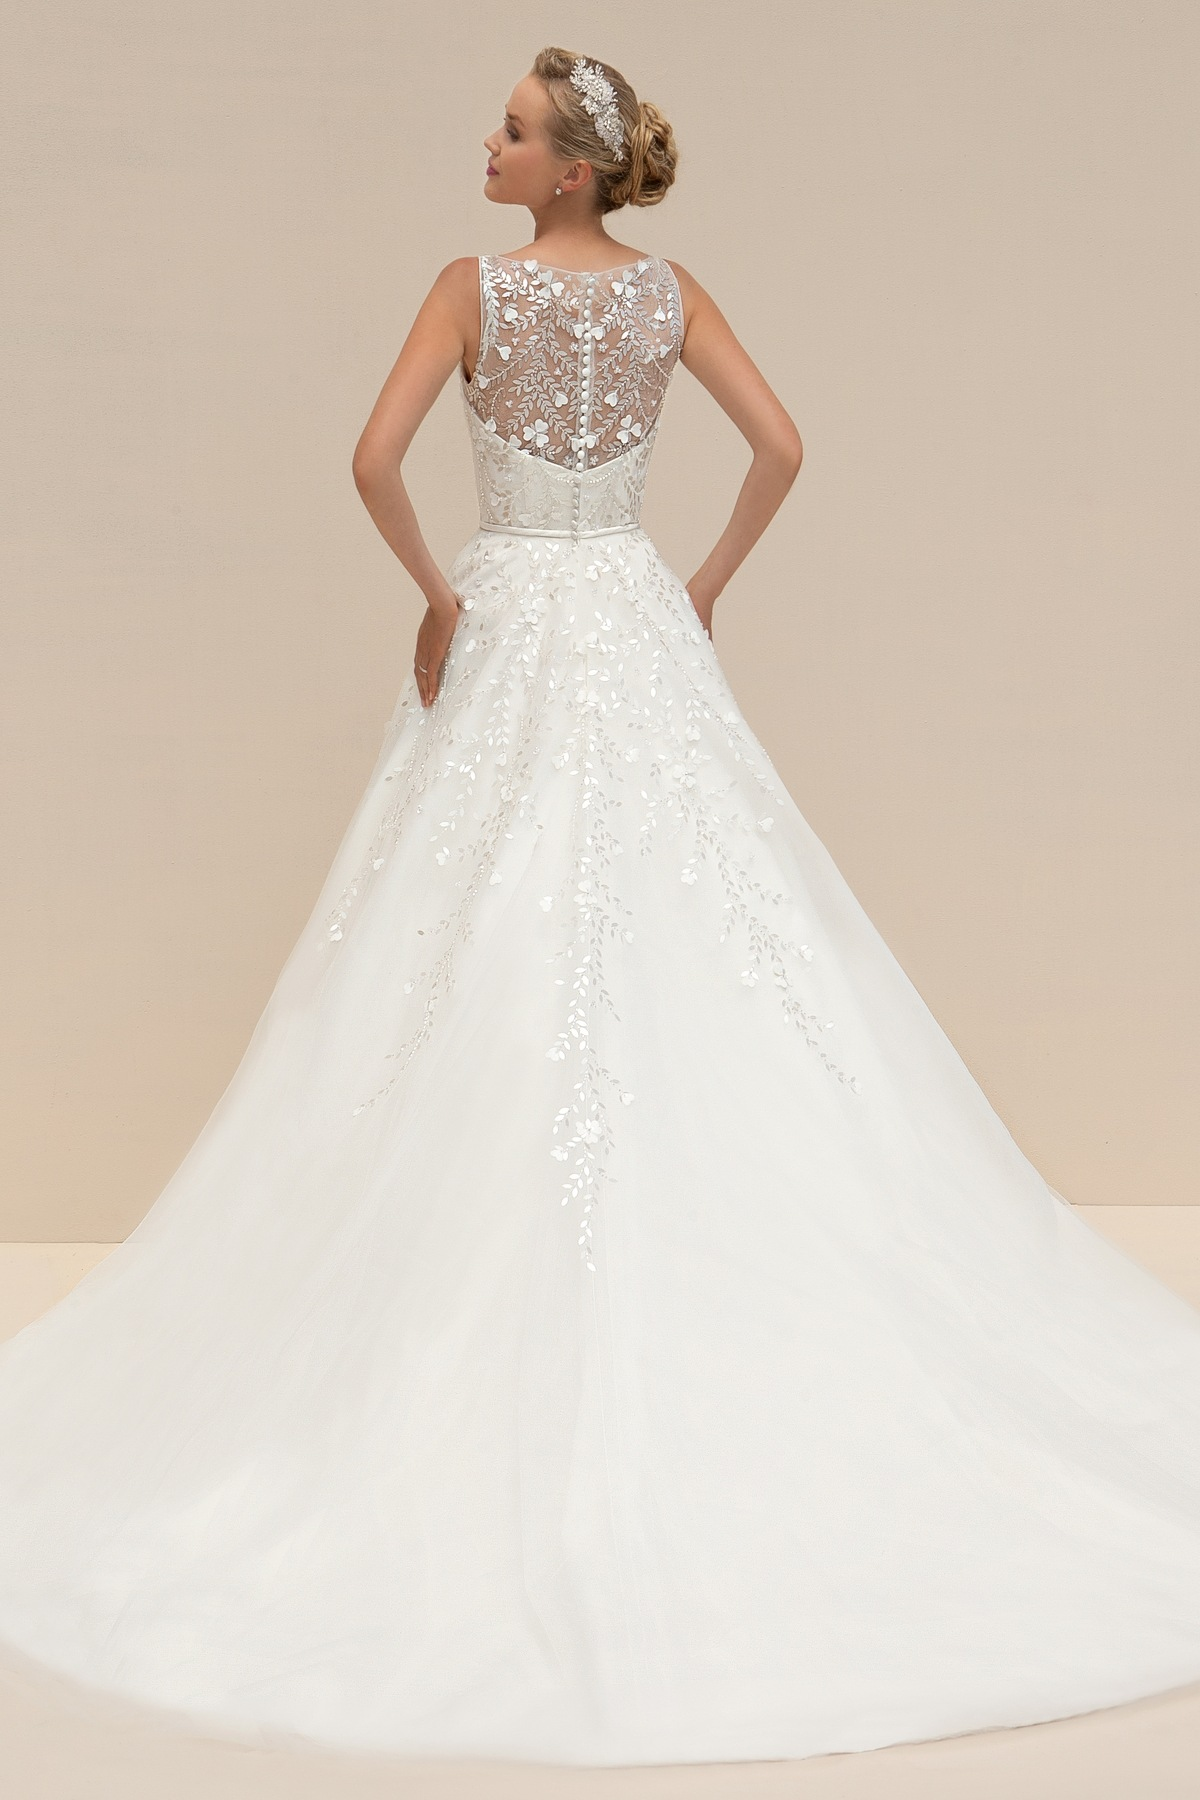 Mark Lesley 7085 Bridal Gown